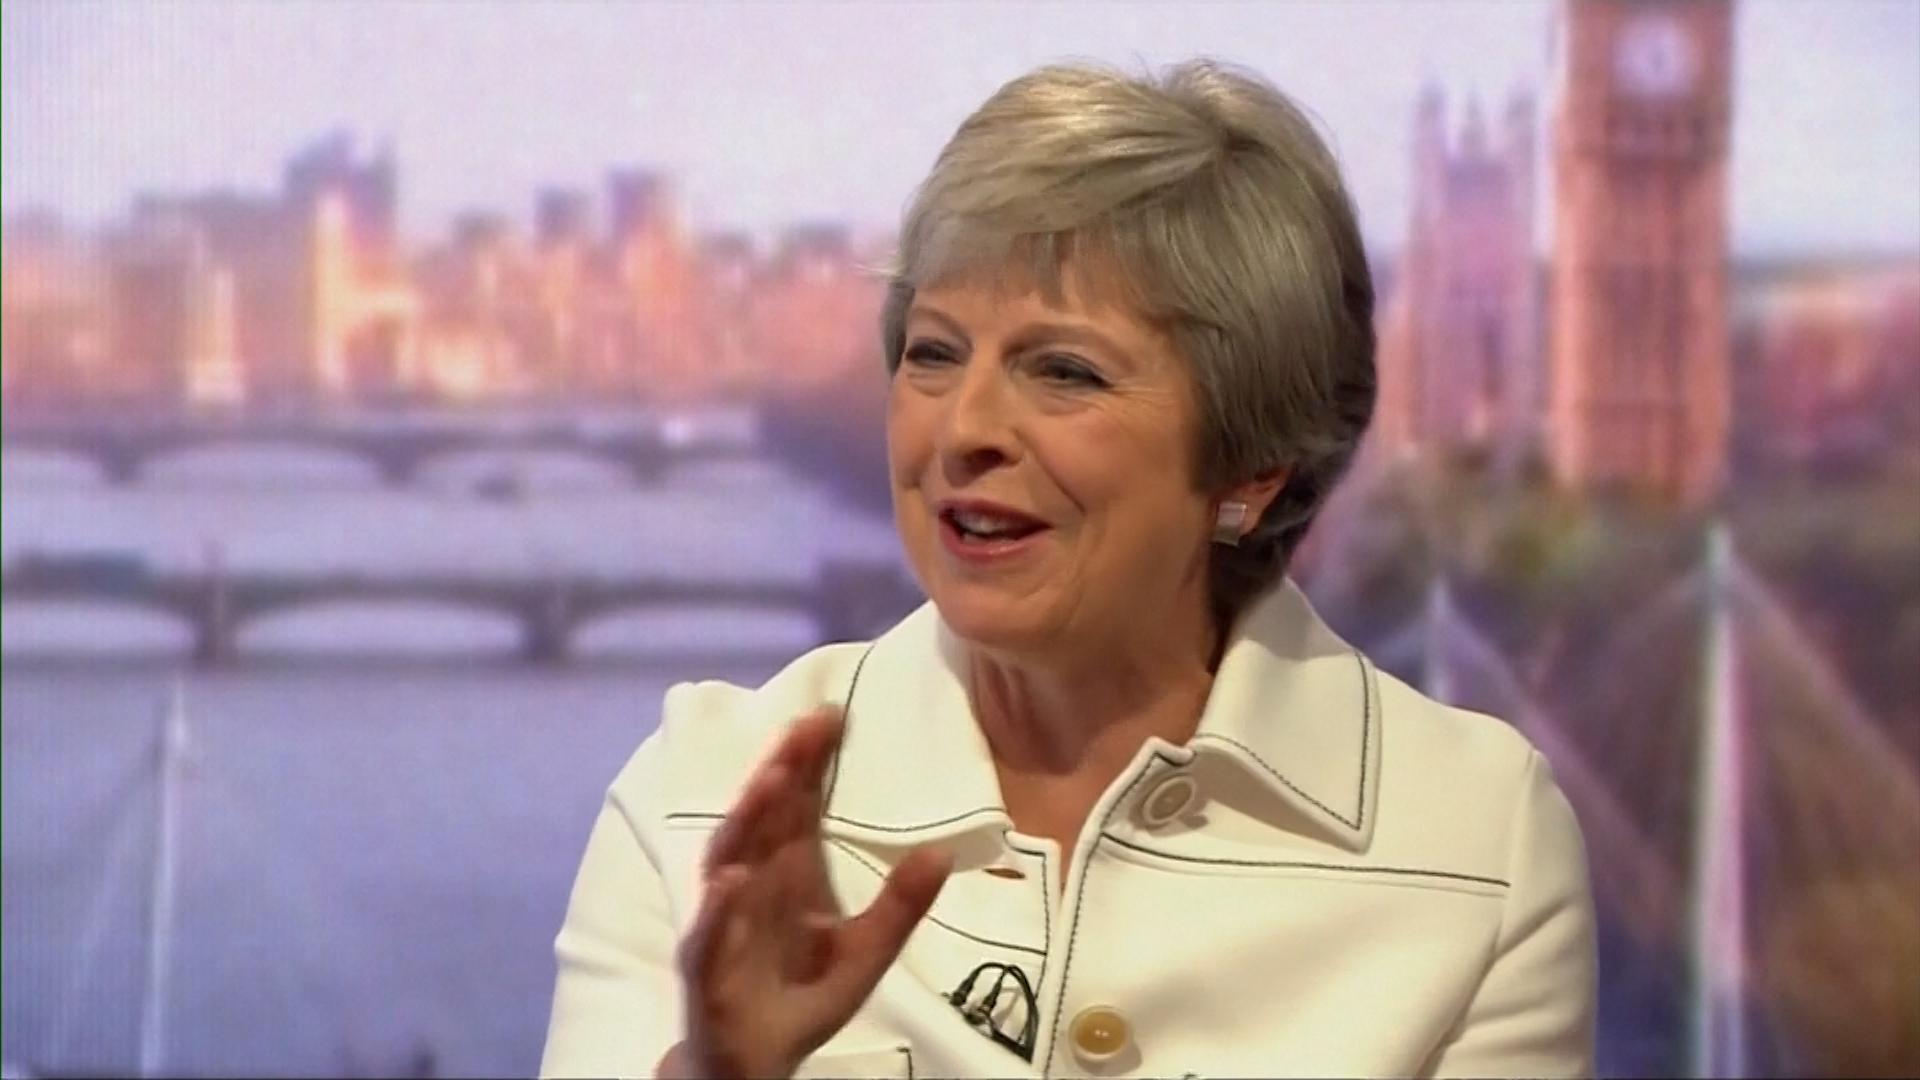 Theresa May's Brexit plan in turmoil | Ireland